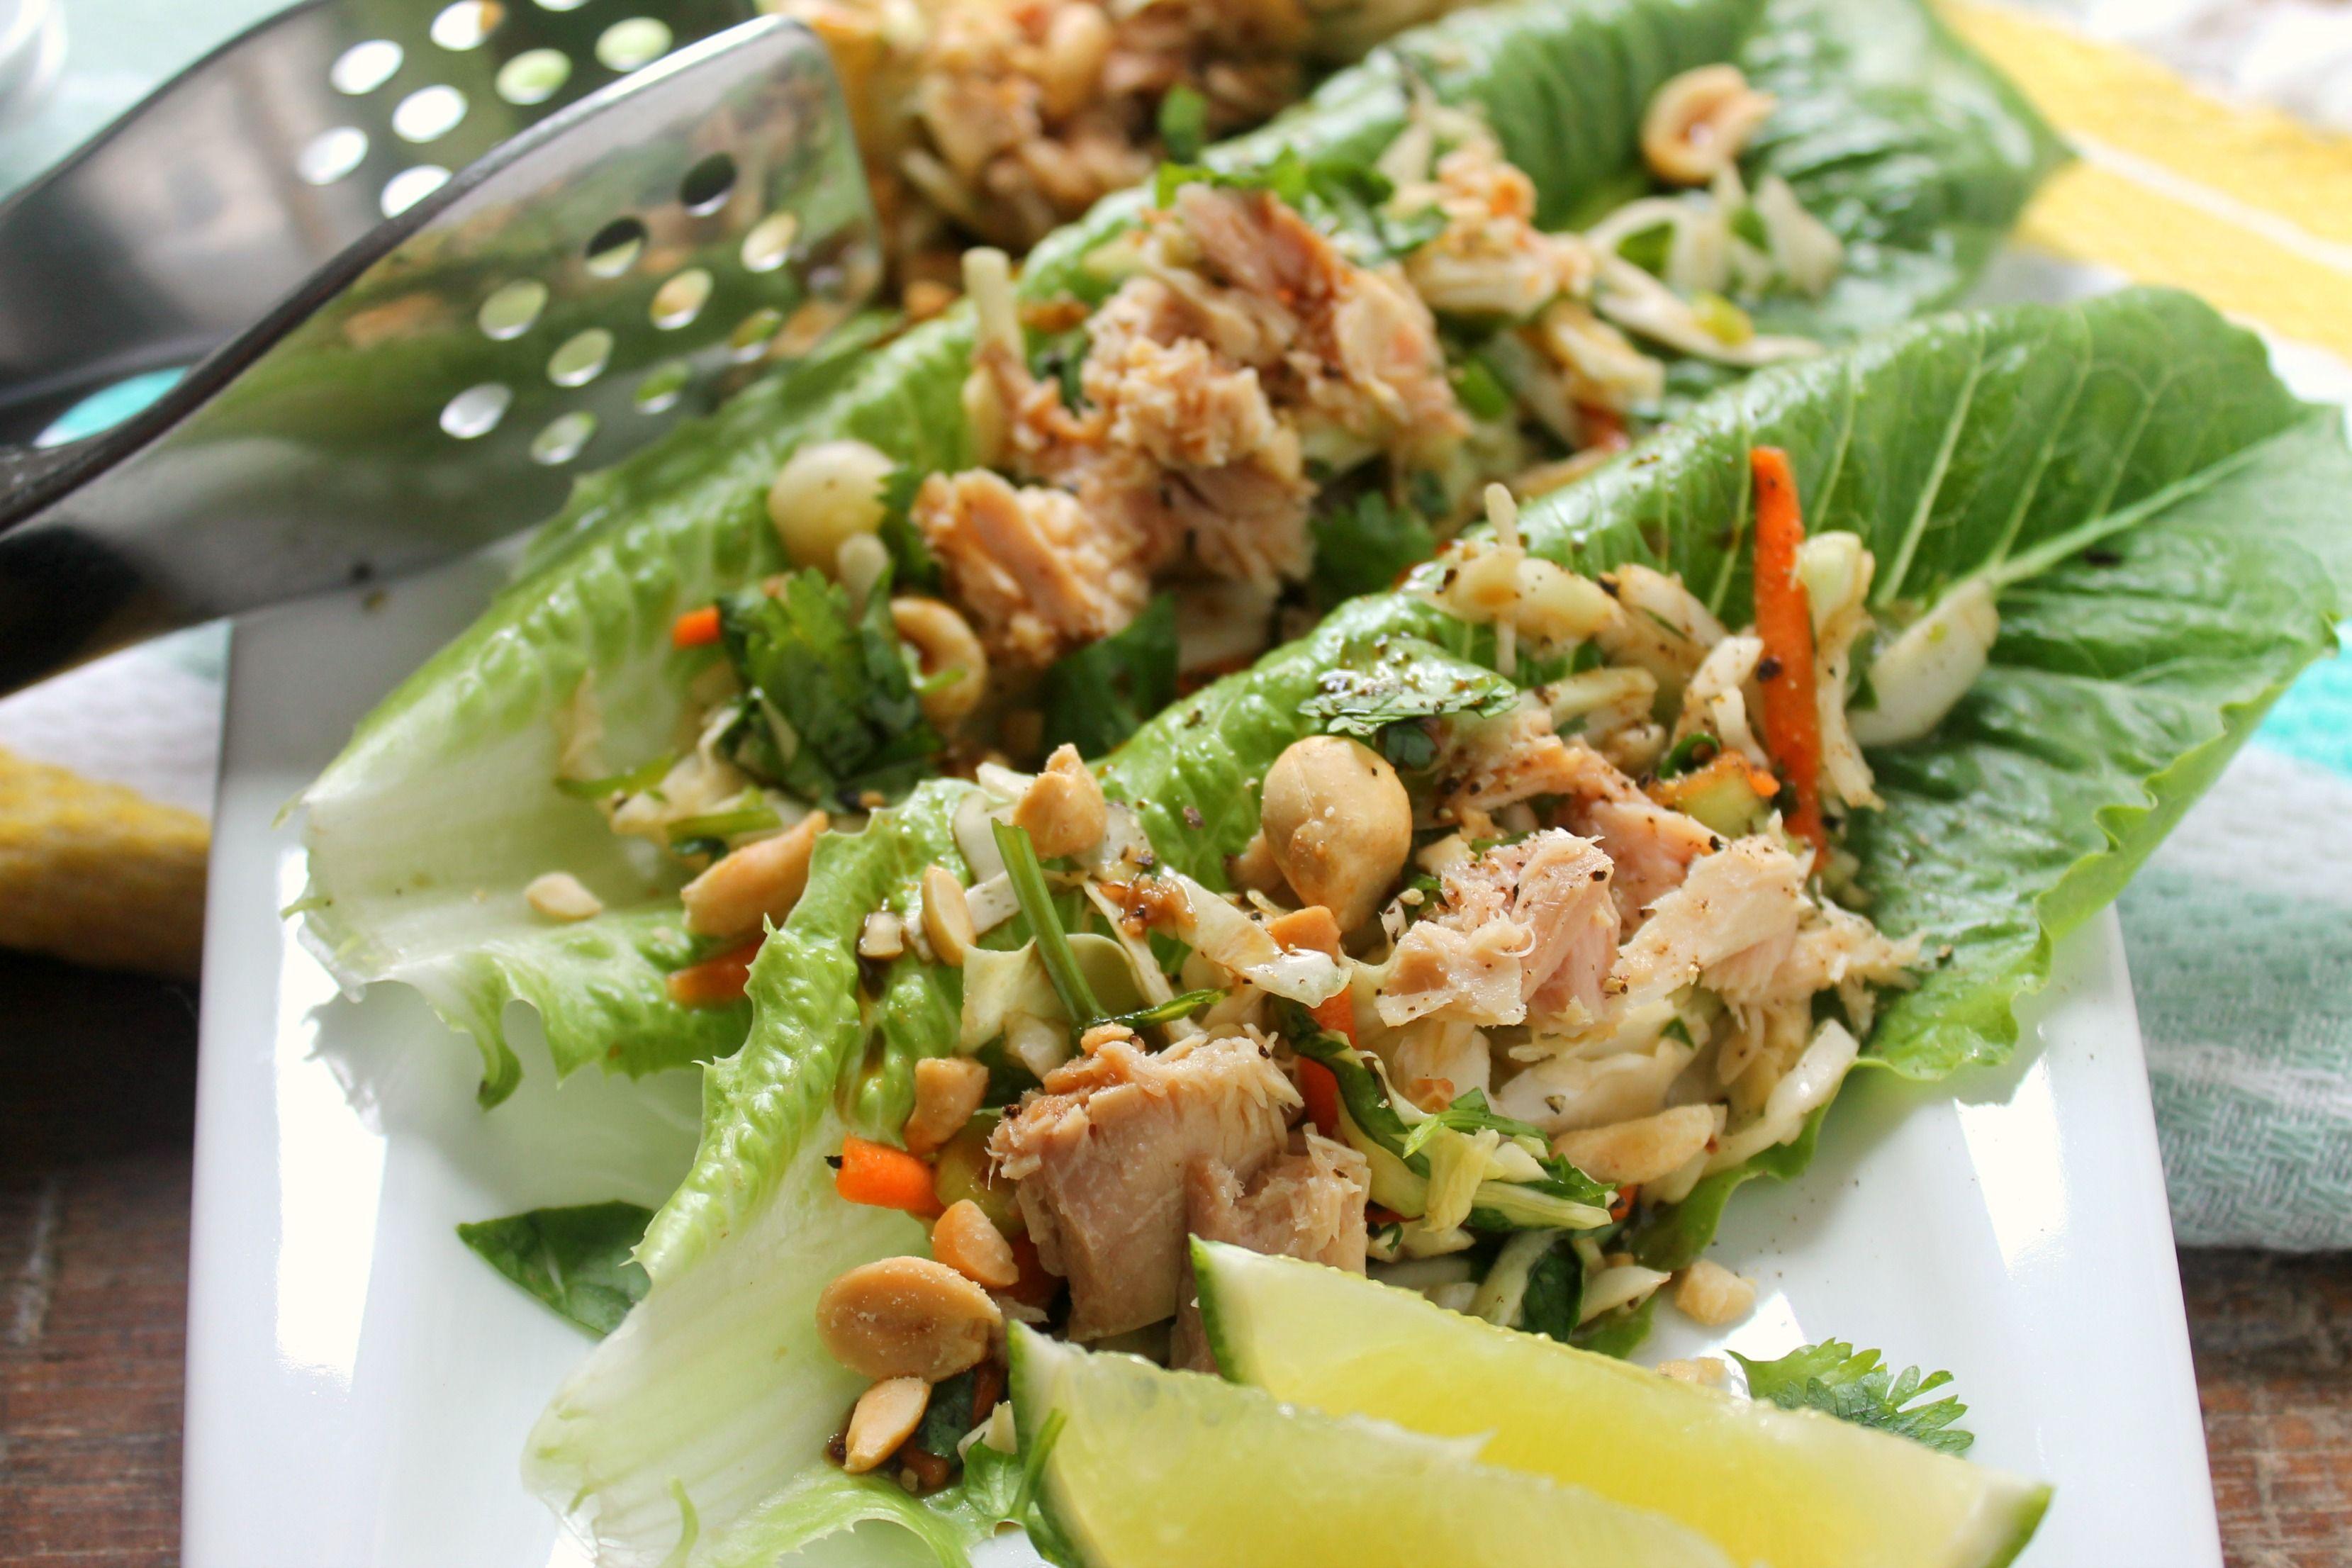 Asian Inspired Tuna Lettuce Wraps via JennySheaRawn.com